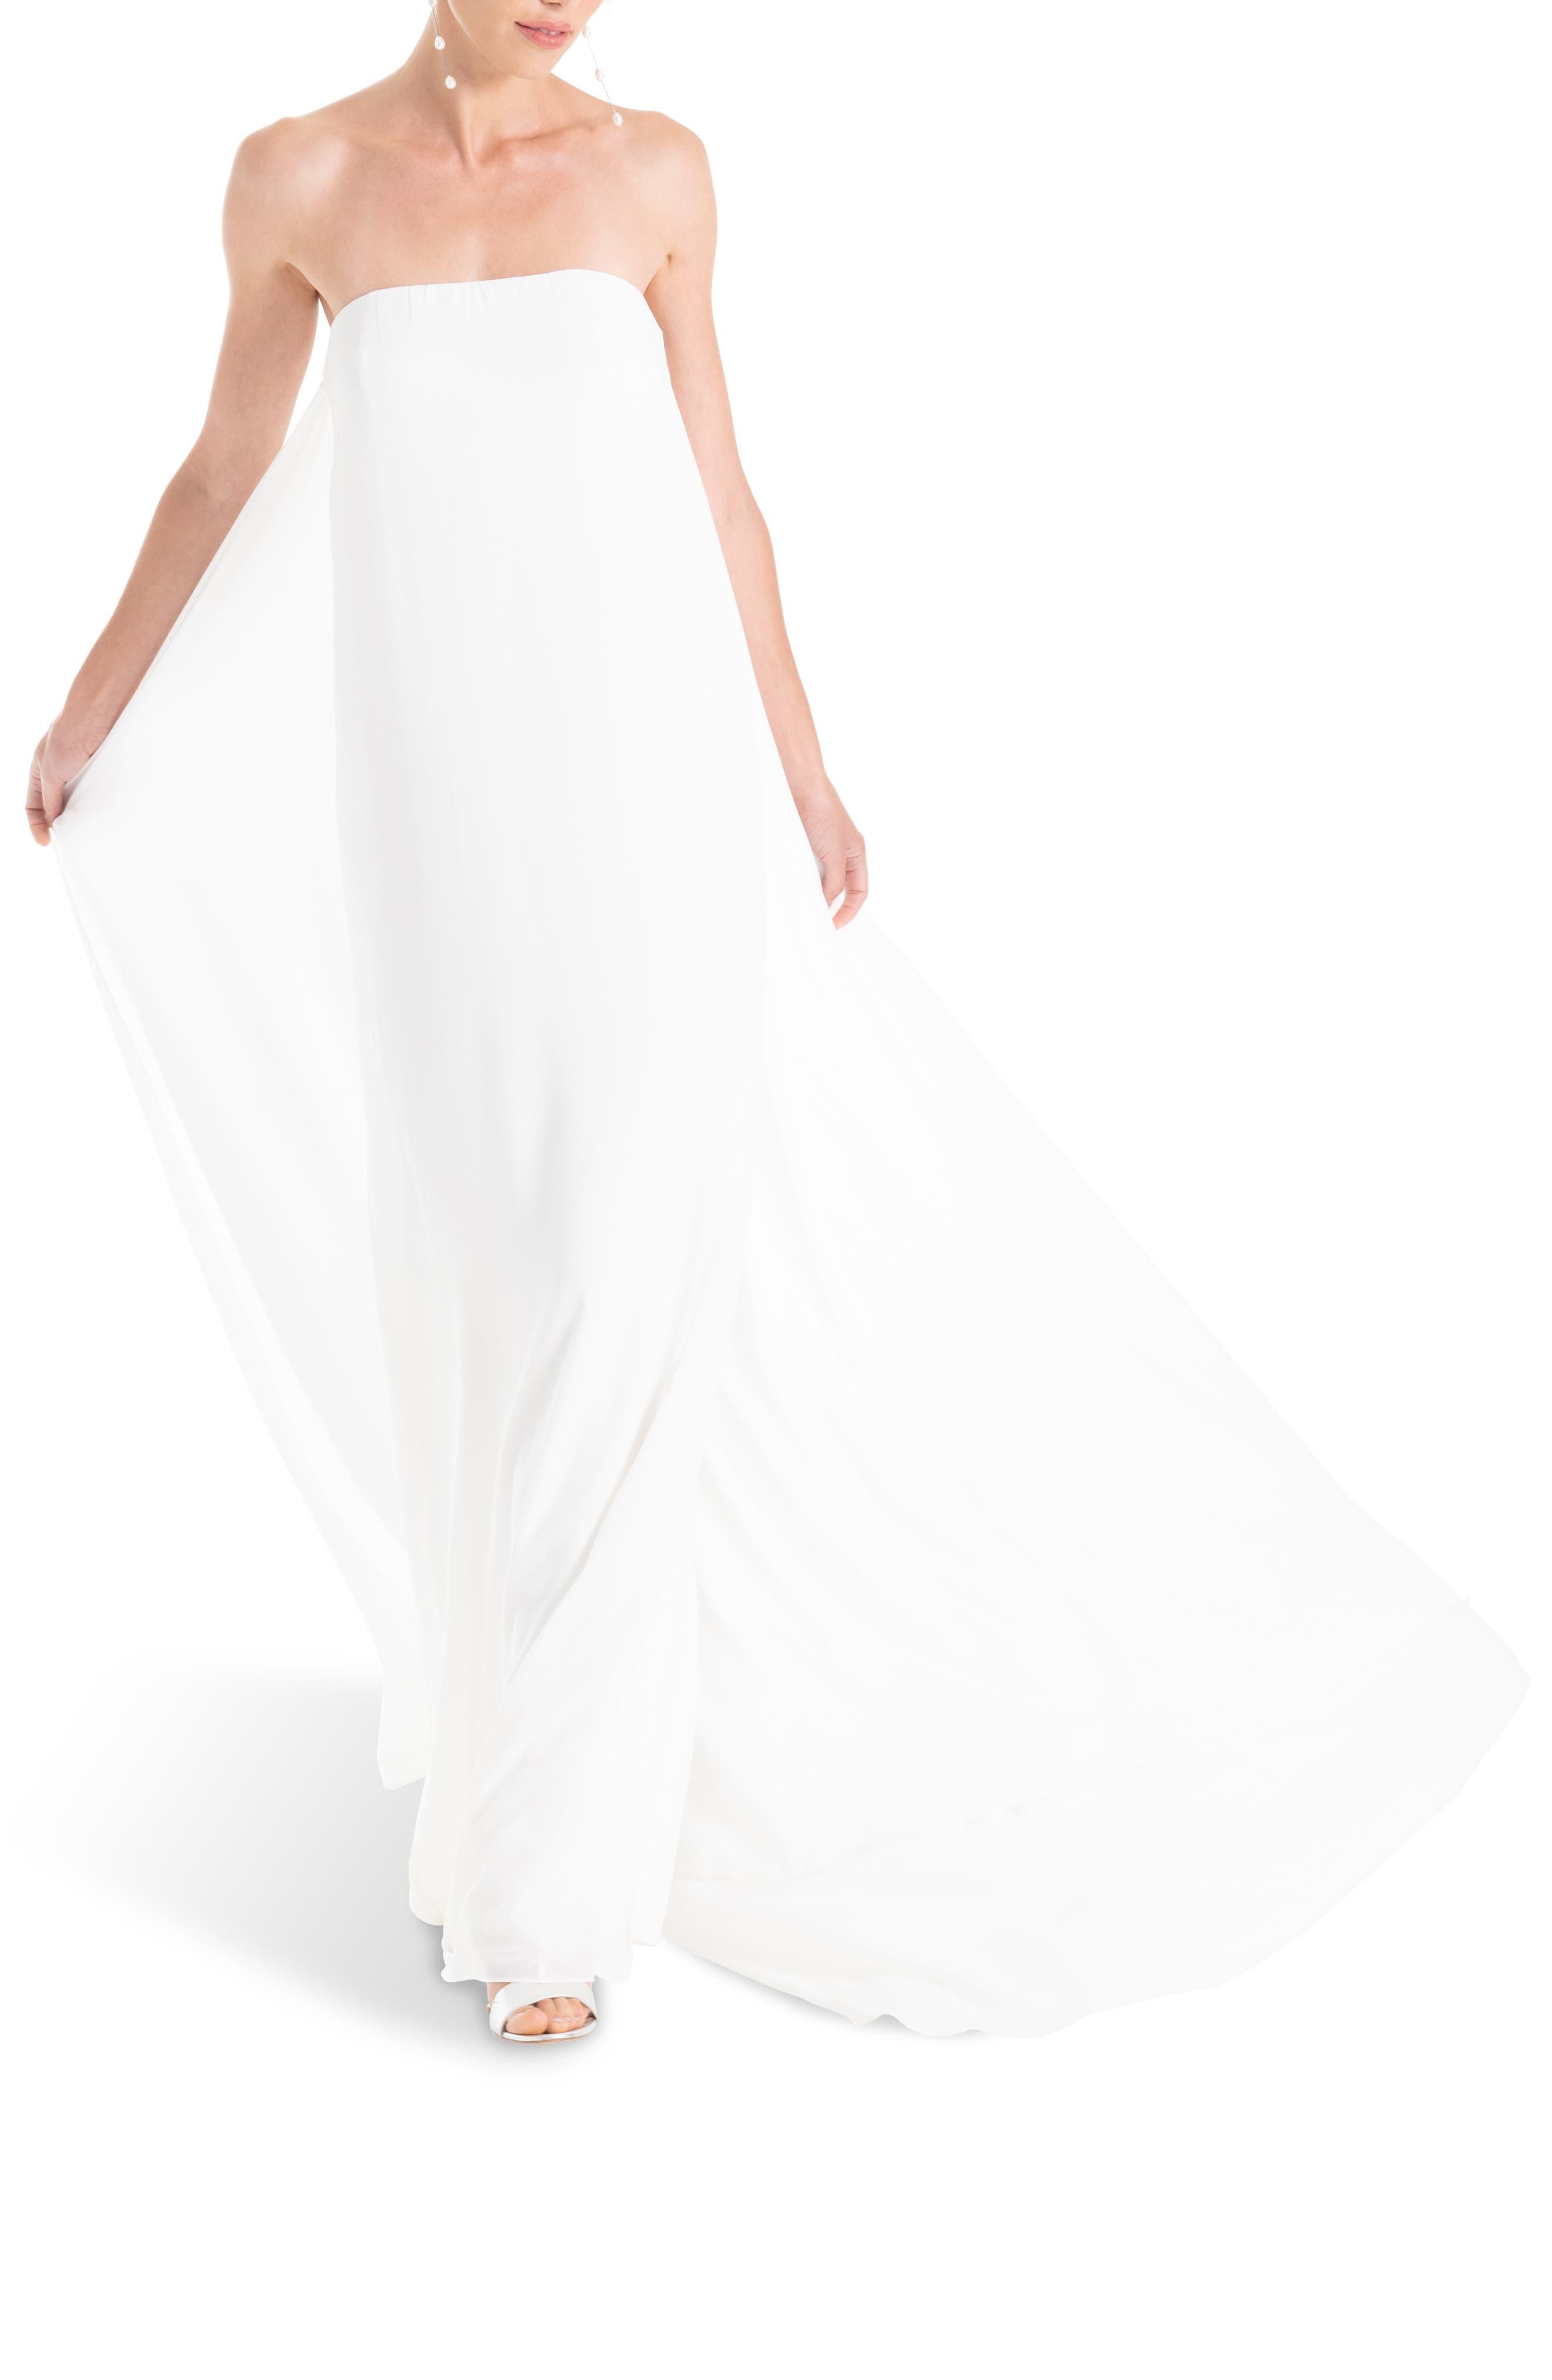 Vintage Style Wedding Dresses, Vintage Inspired Wedding Gowns Womens Joanna August Joni Strapless Column Wedding Dress $985.00 AT vintagedancer.com